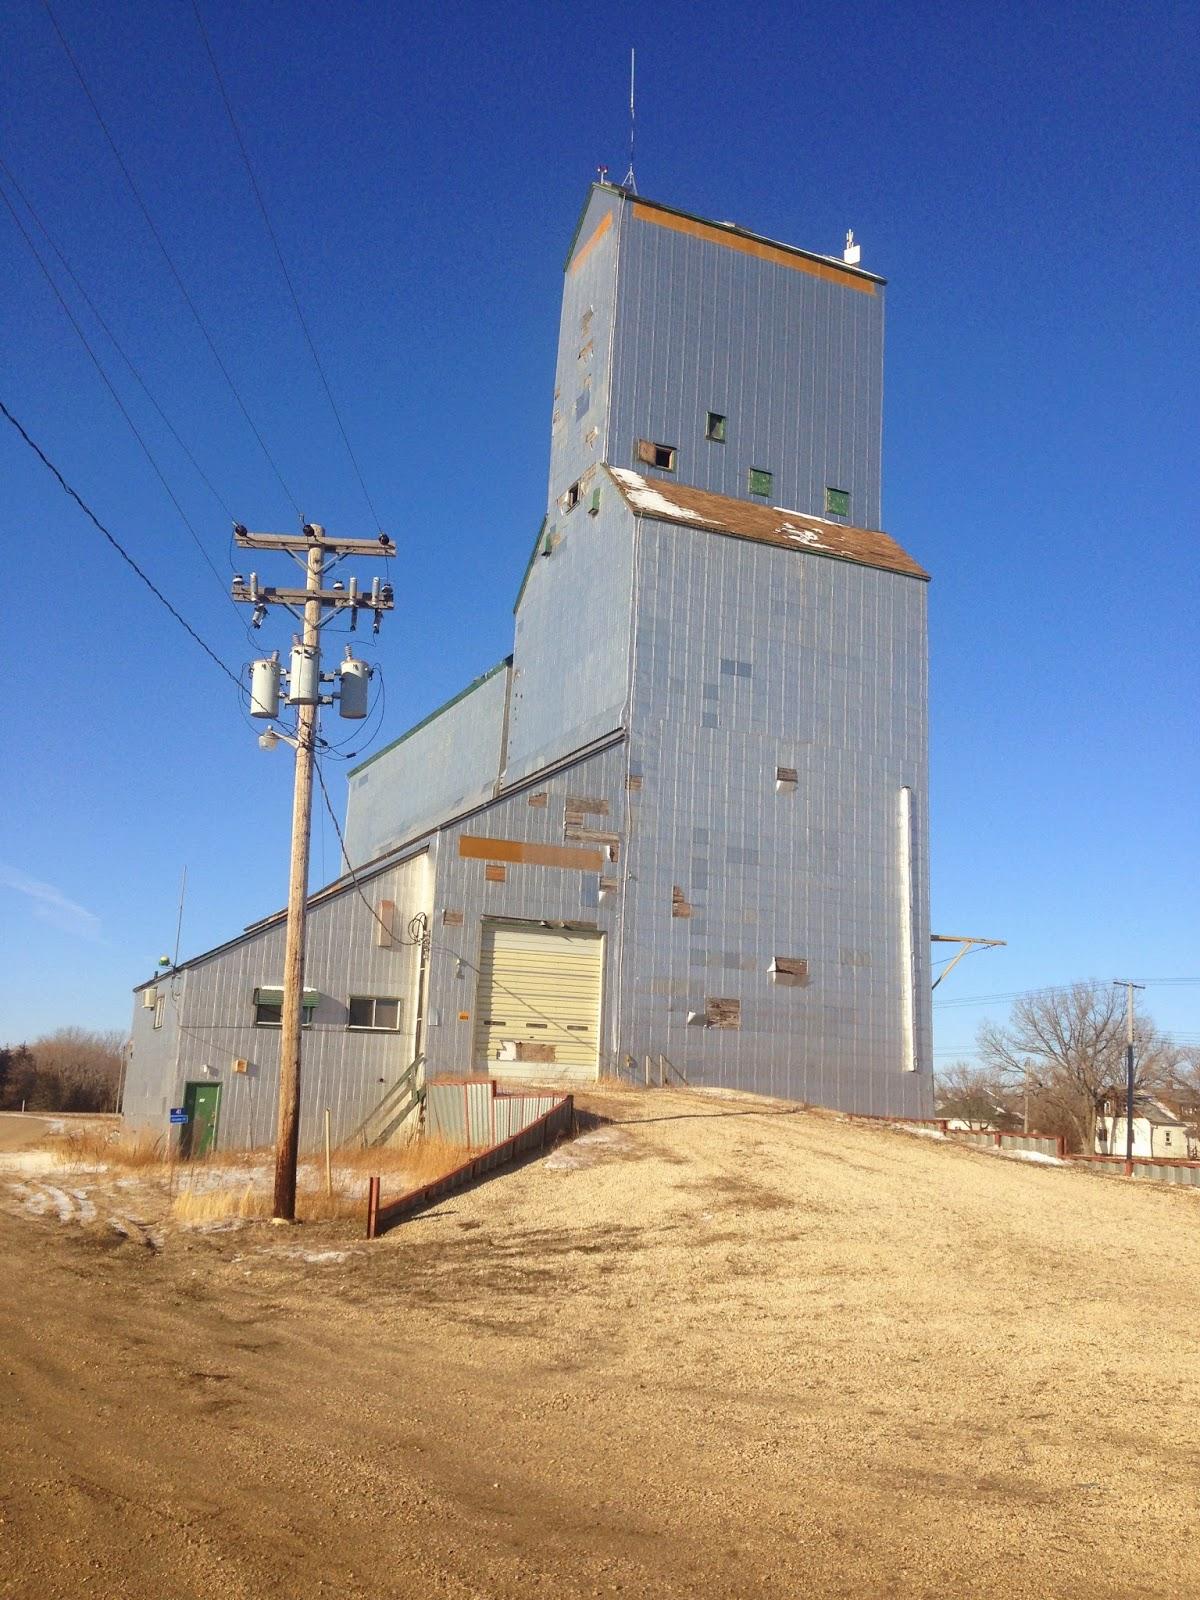 Royal lepage carman grain elevator for sale in lowe farm Elevators for sale